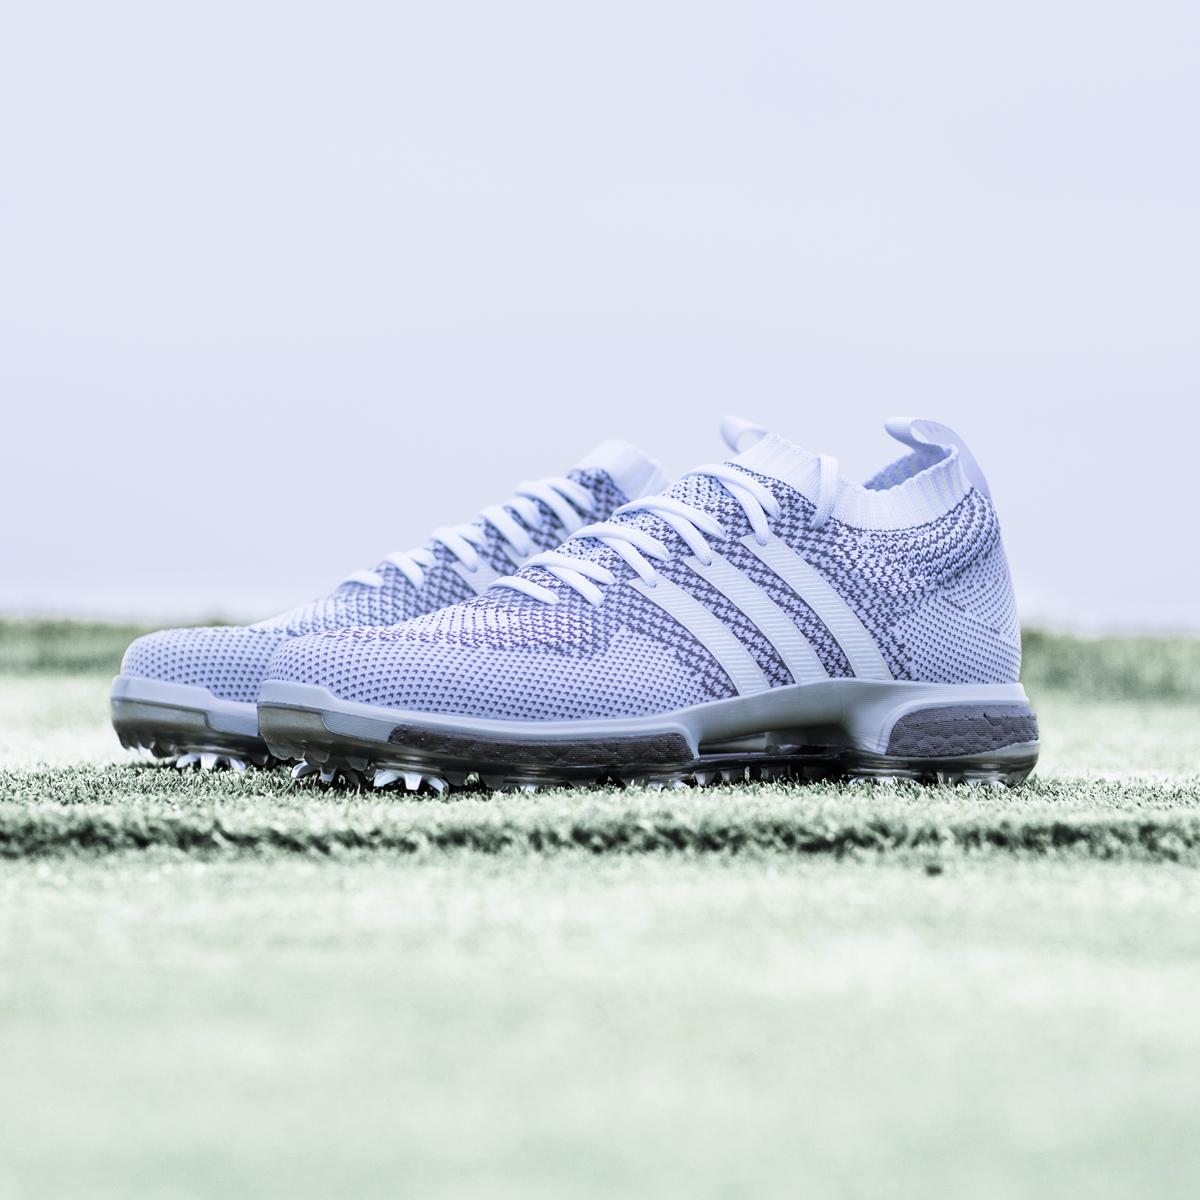 Adidas announces special-edition silver